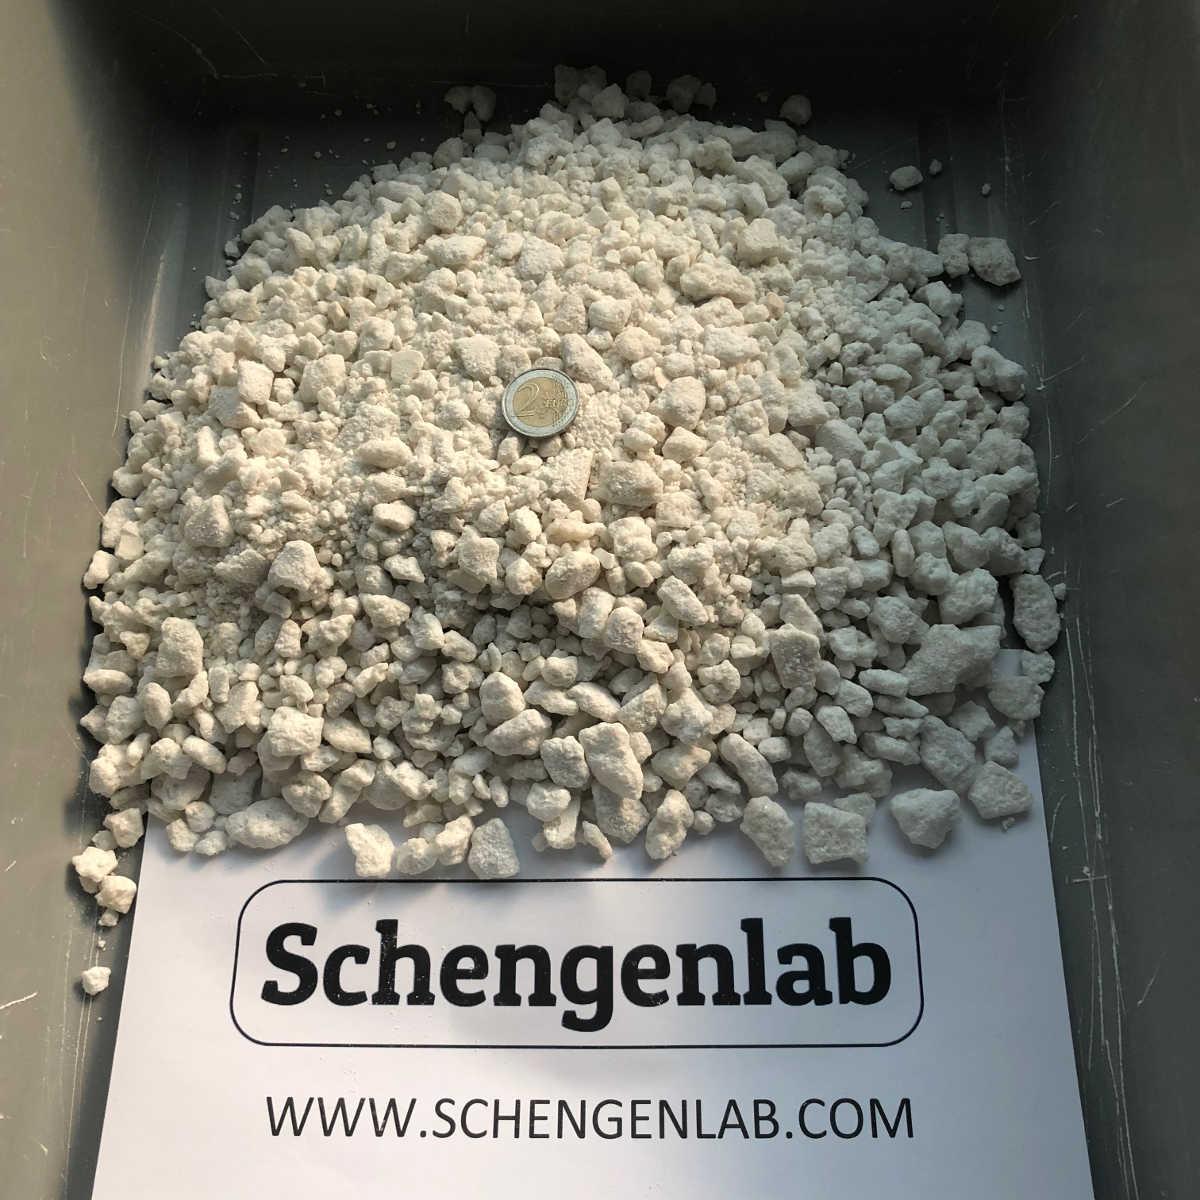 3MMC 🔵 4CMC 🔴 Schengenlab Buy Wholesale Bulk Order